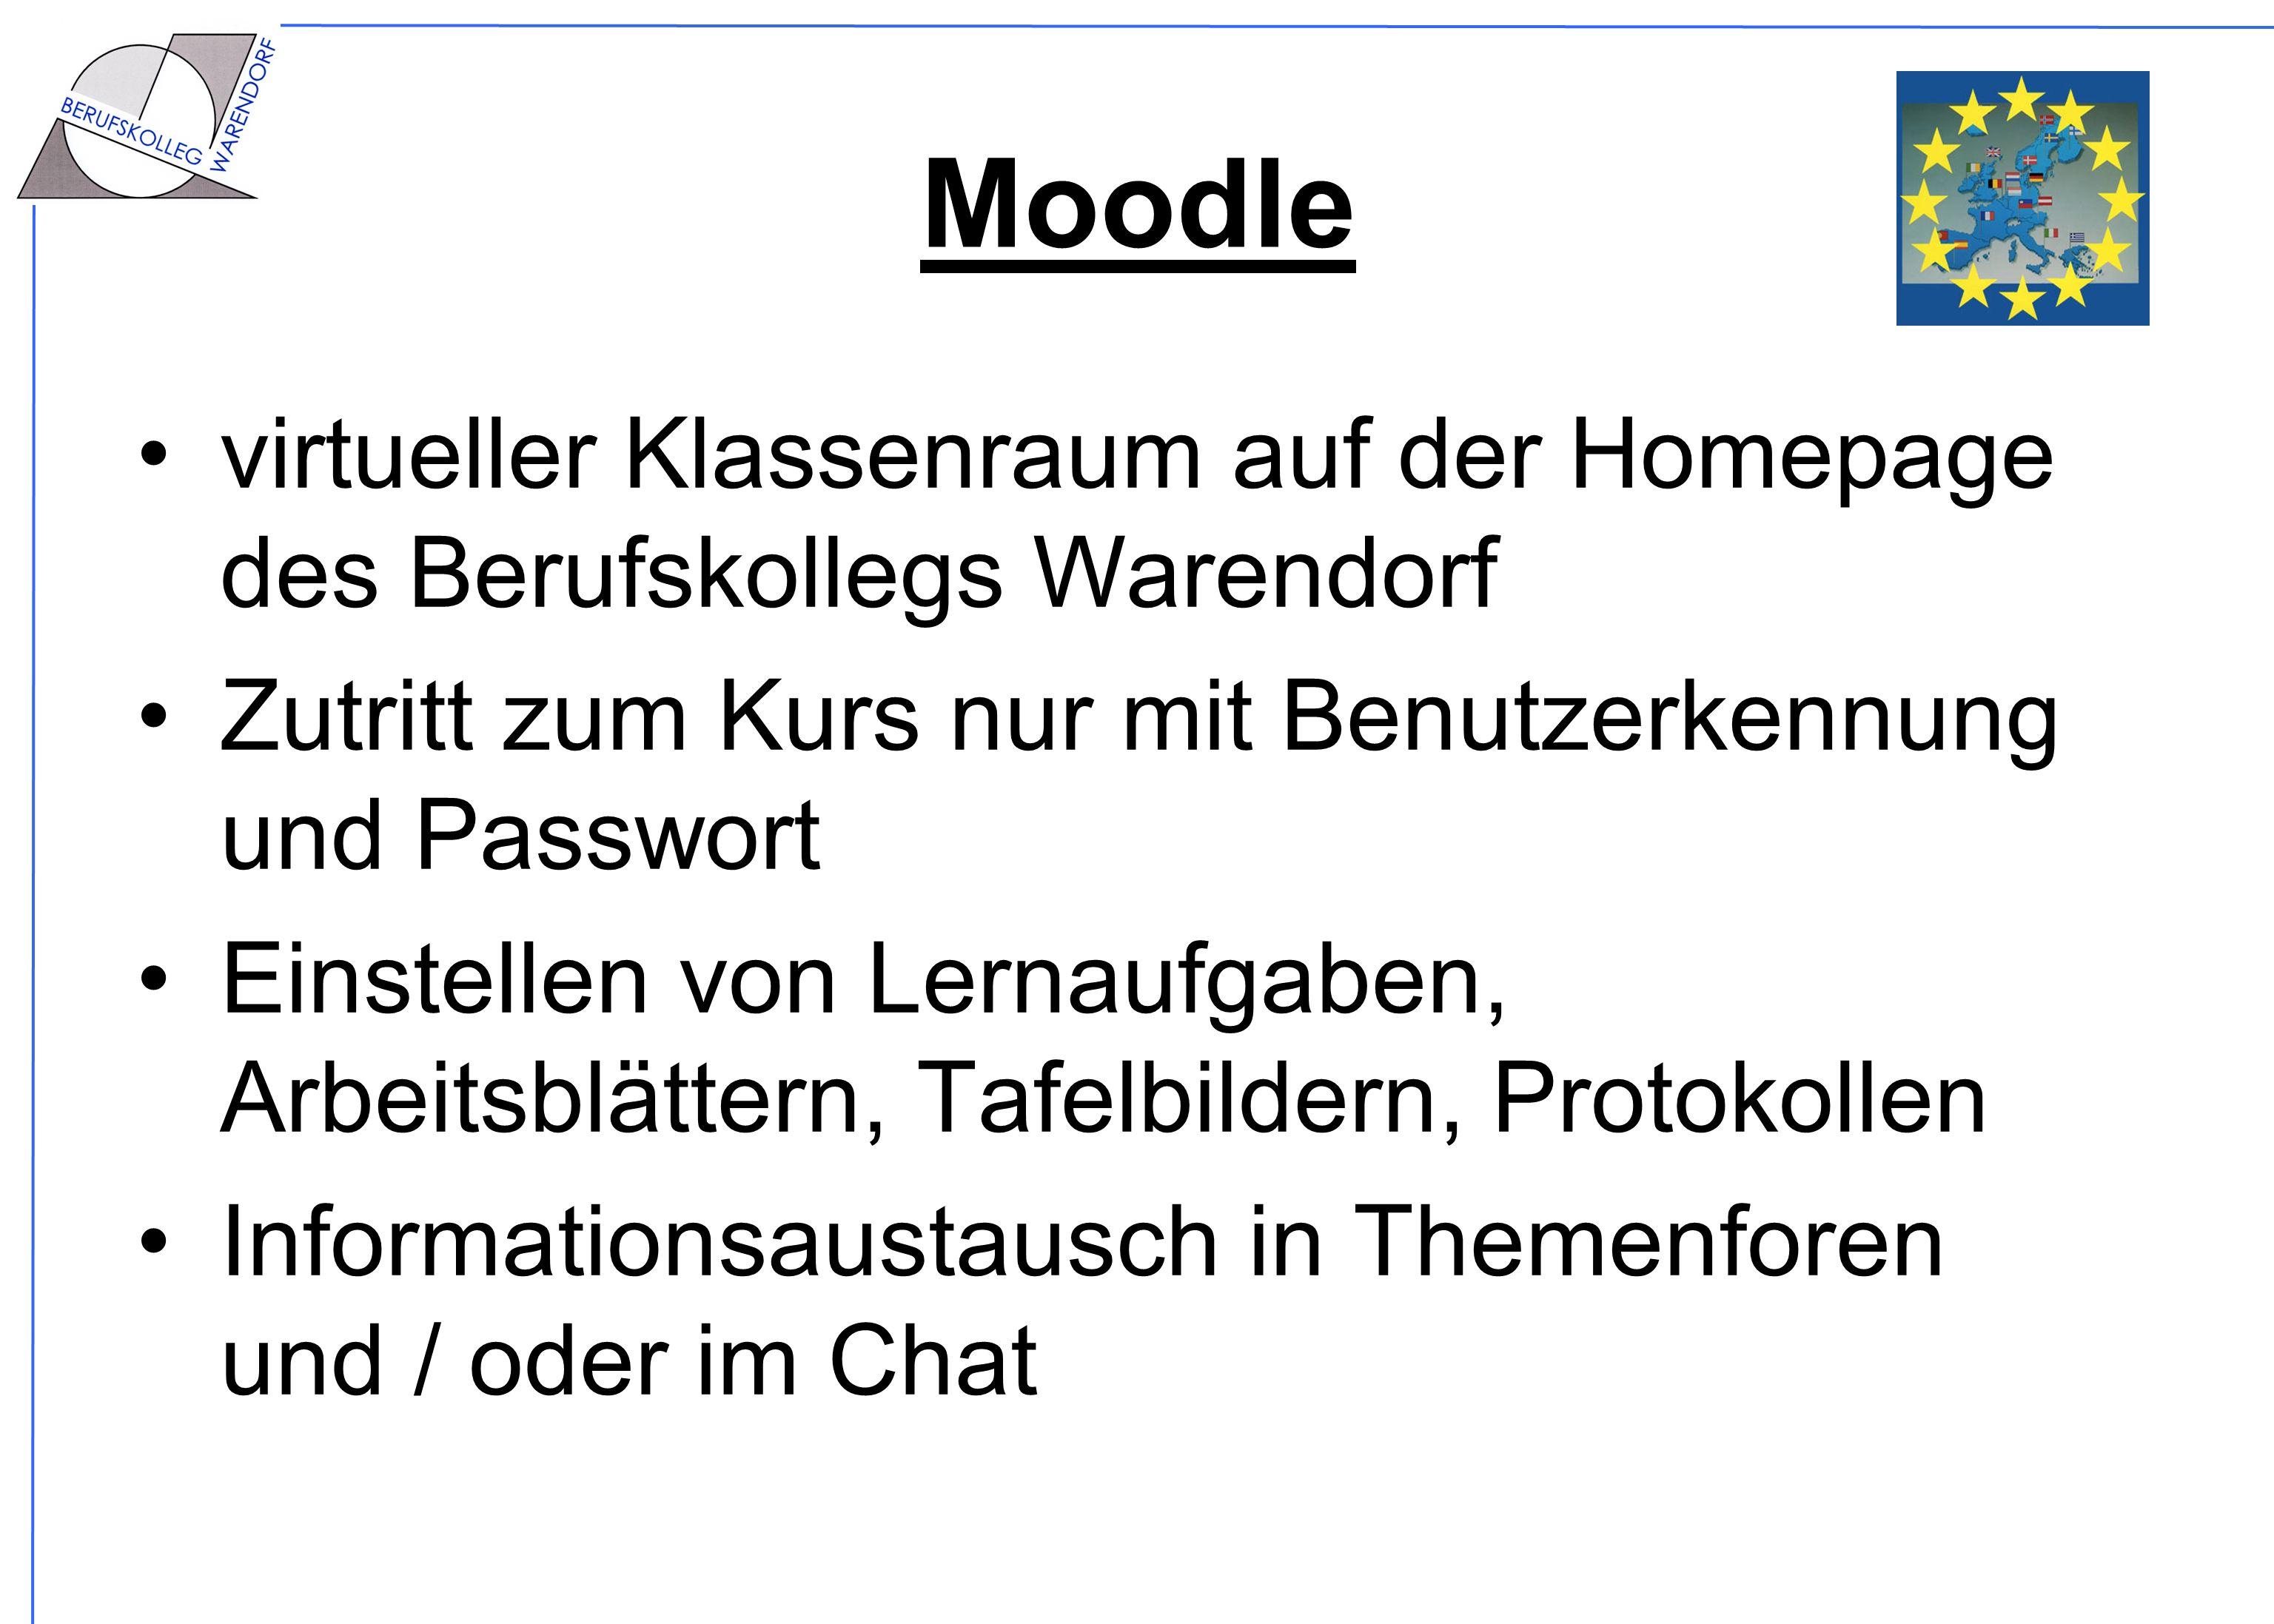 Ziemlich Kindergarten Arbeitsblatt Vorschule Mathe Printables Frühe ...